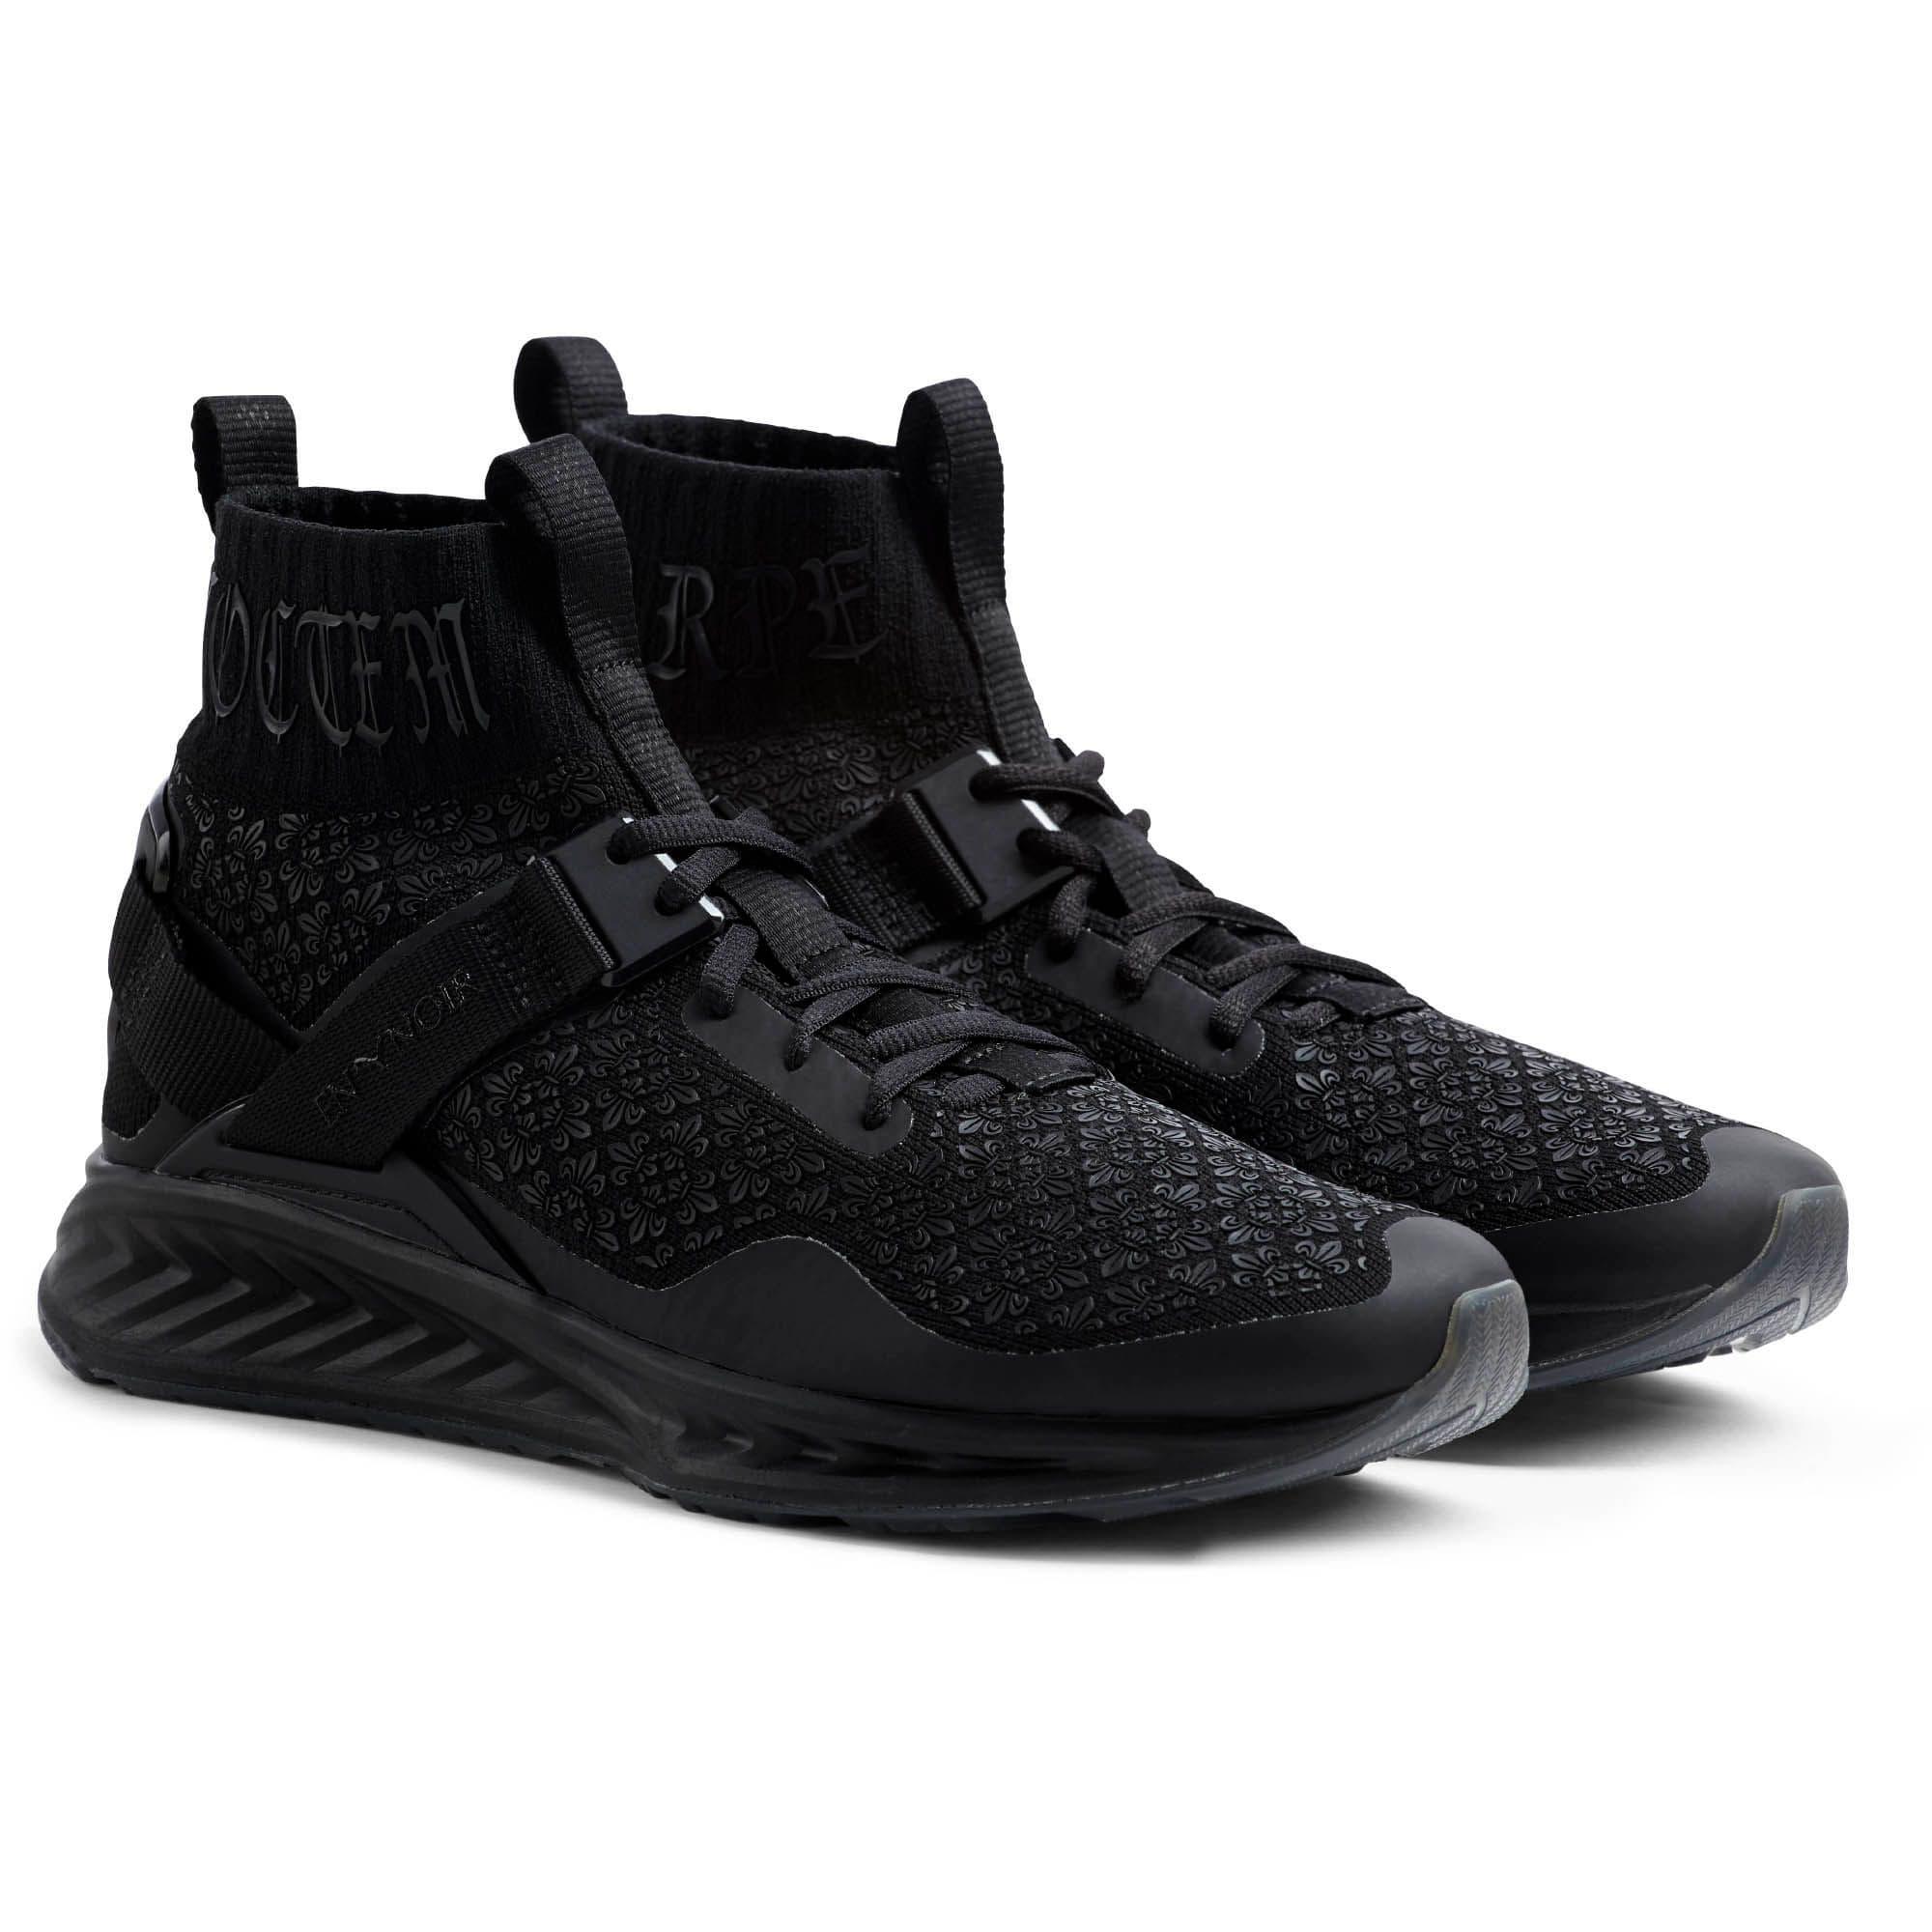 Thumbnail 2 of IGNITE evoKNIT En Noir Men's Training Shoes, Puma Black-Puma Black, medium